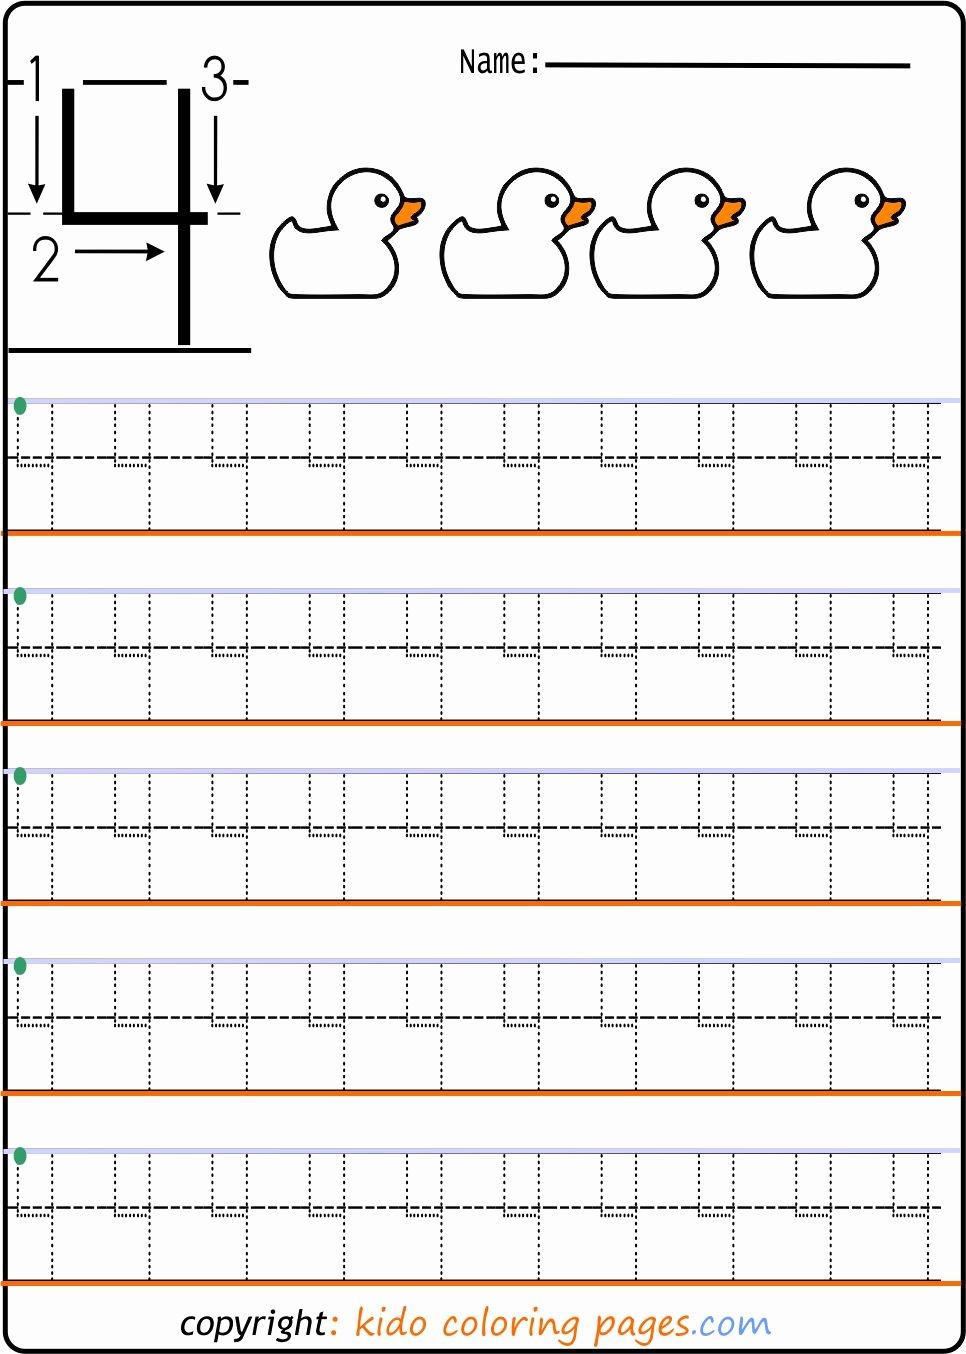 Number Tracing Worksheets for Preschoolers Awesome Number Tracing Worksheets for Preschool Kids Coloring